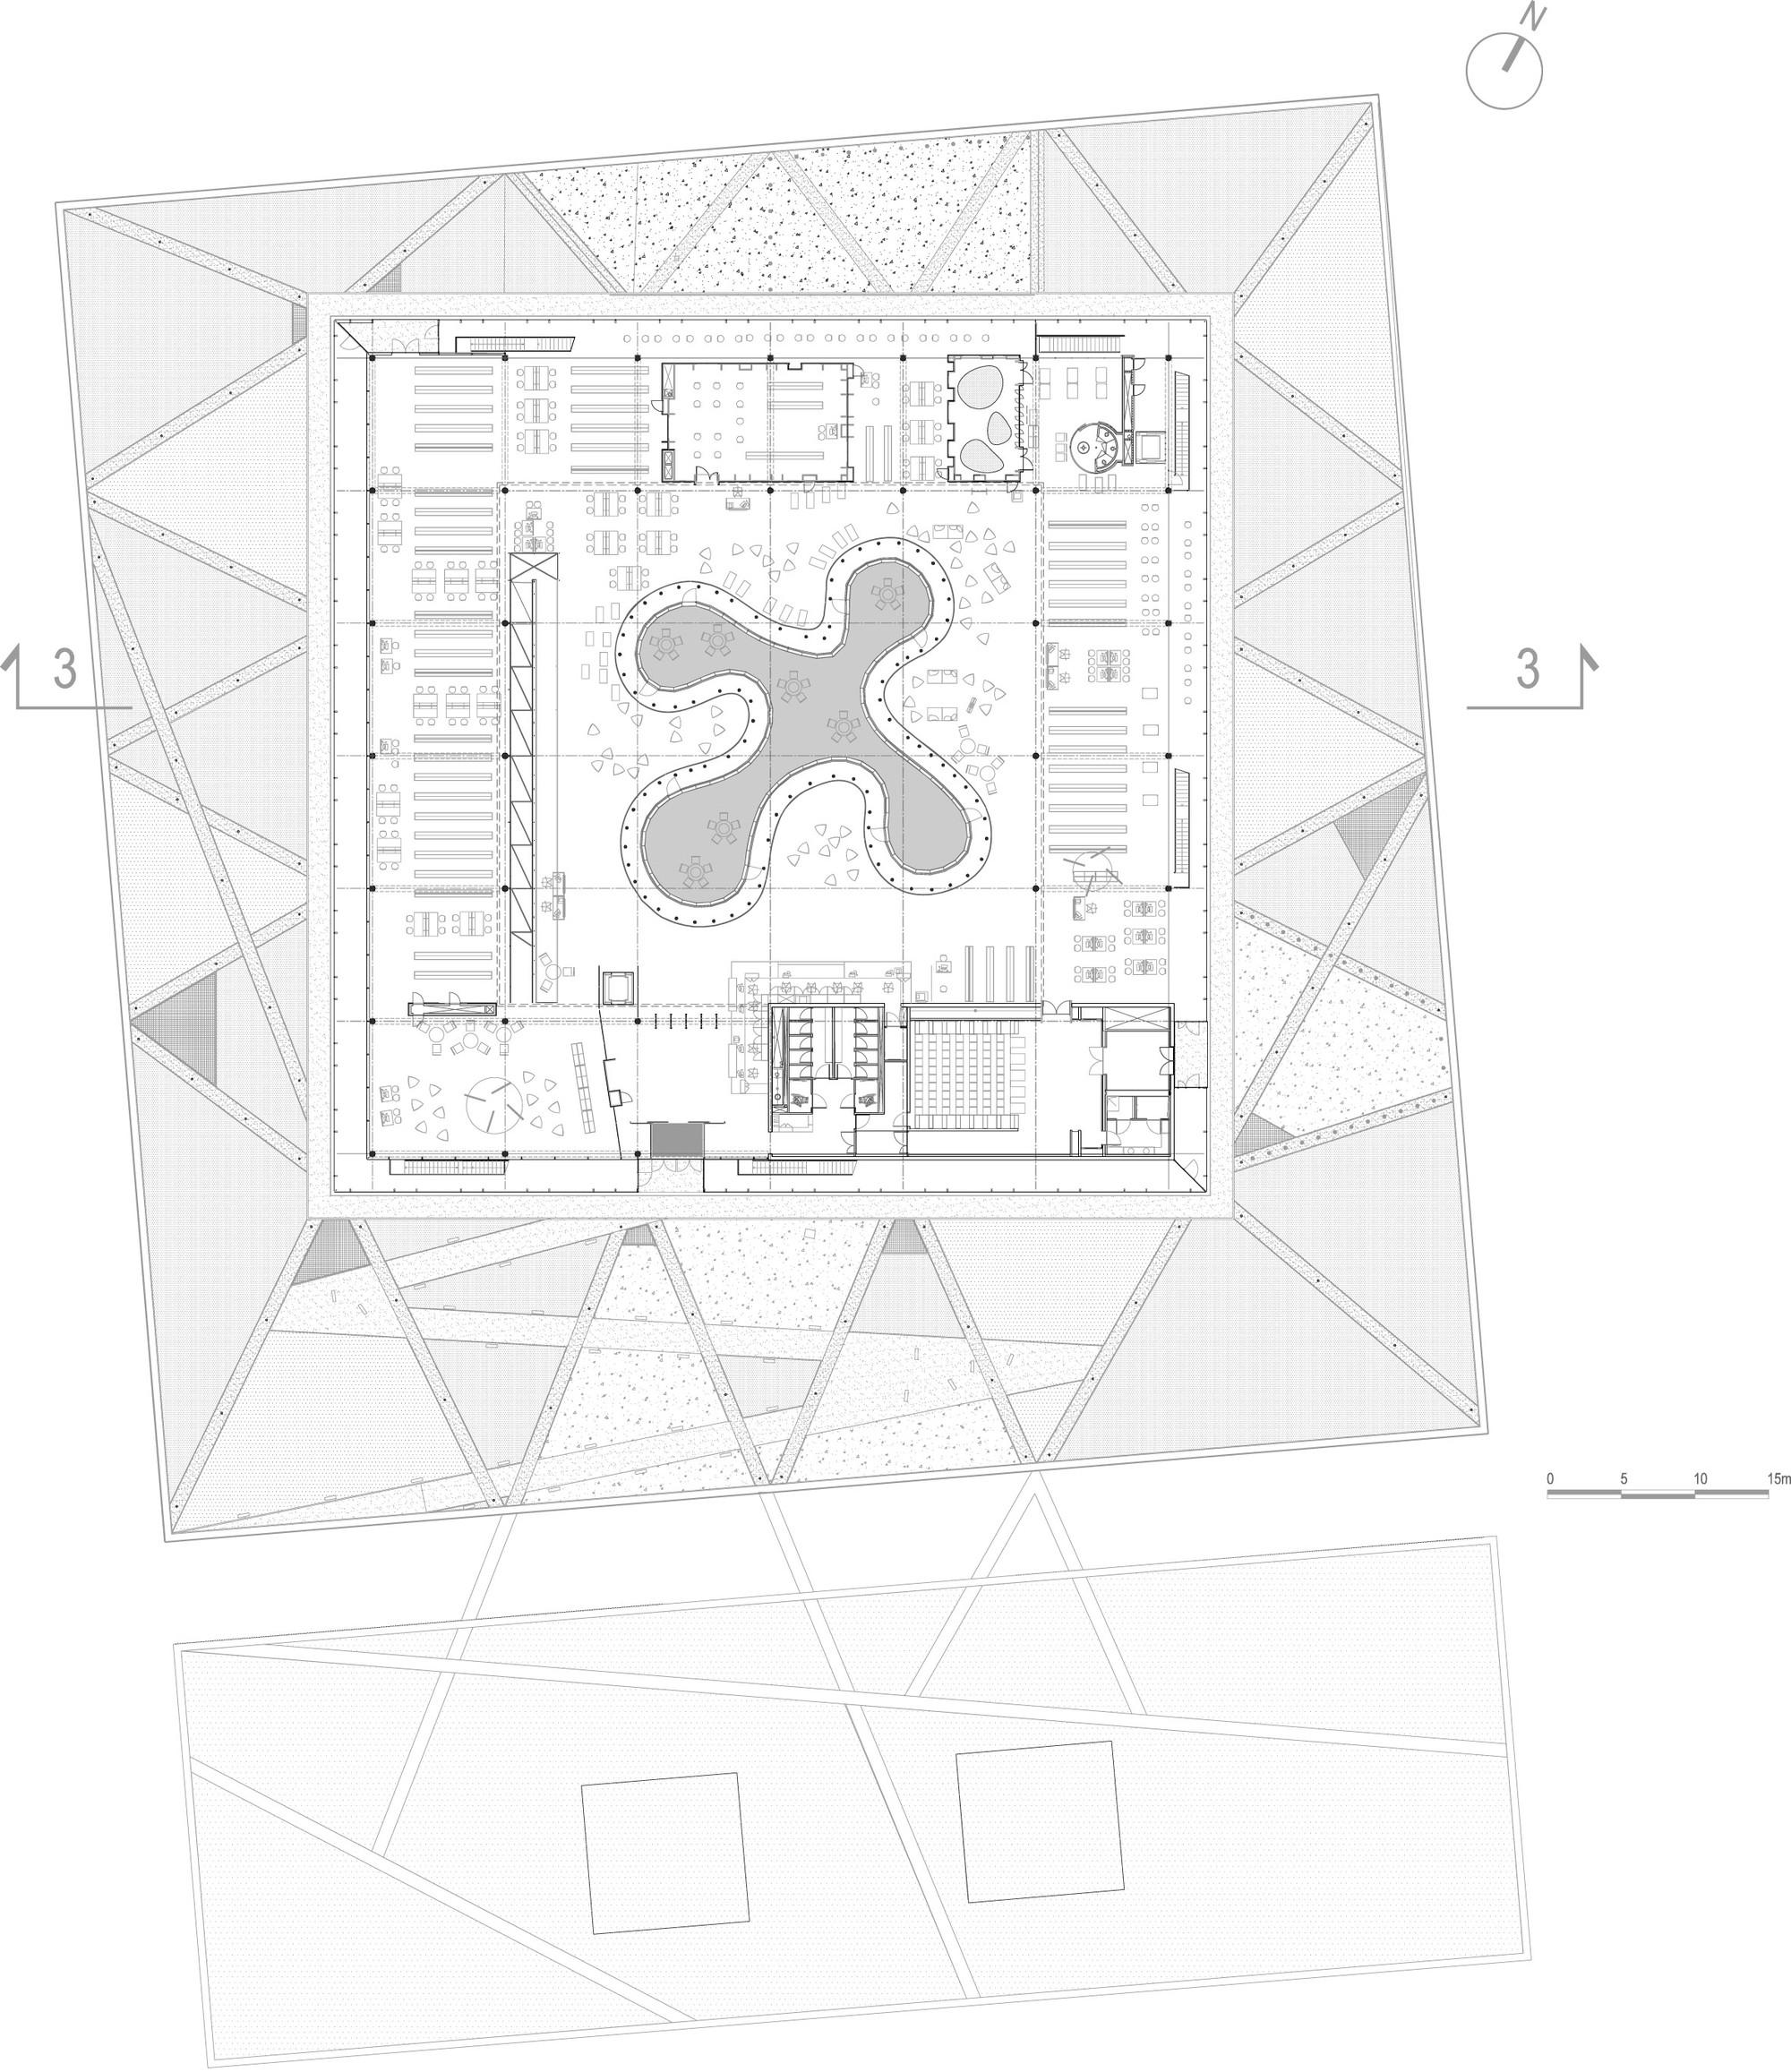 gallery of mont de marsan mediatheque archi5 13. Black Bedroom Furniture Sets. Home Design Ideas